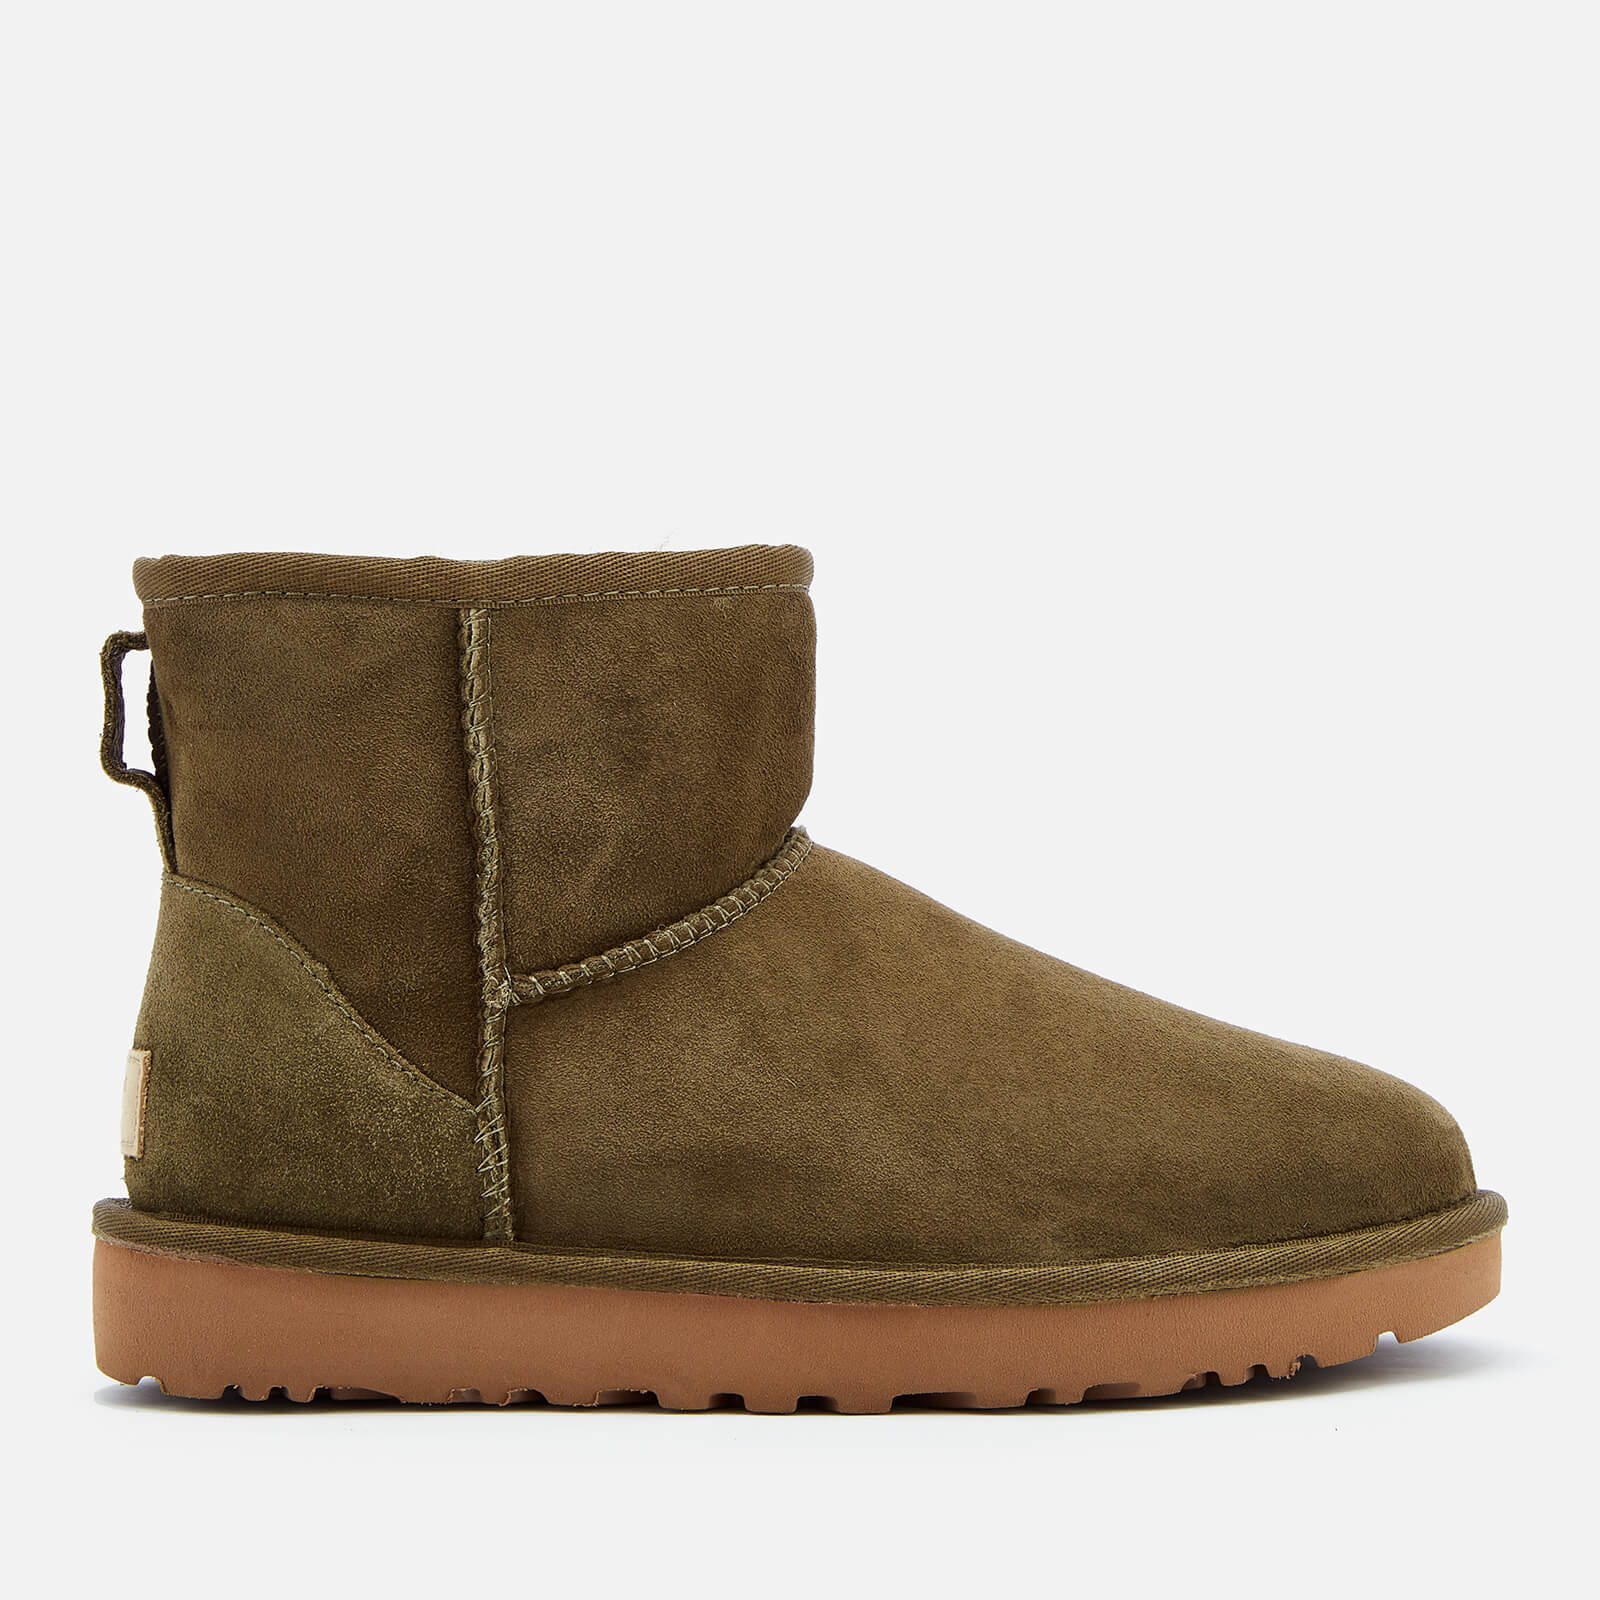 10acc718e39 UGG Women's Classic Mini II Sheepskin Boots - Spruce